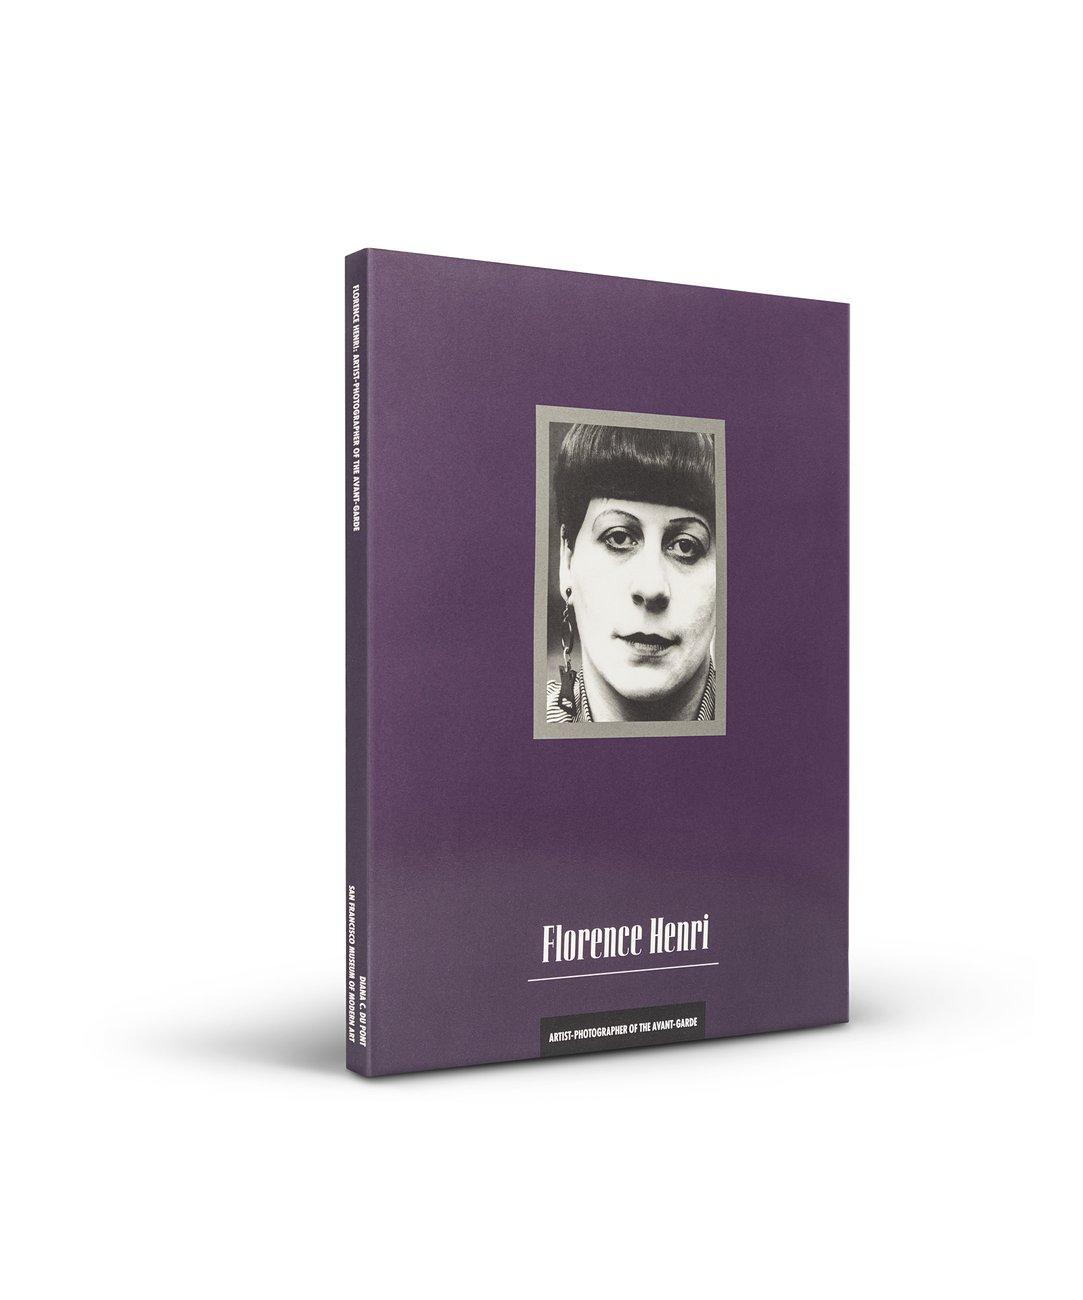 Florence Henri: Artist-Photographer of the Avant Garde, cover